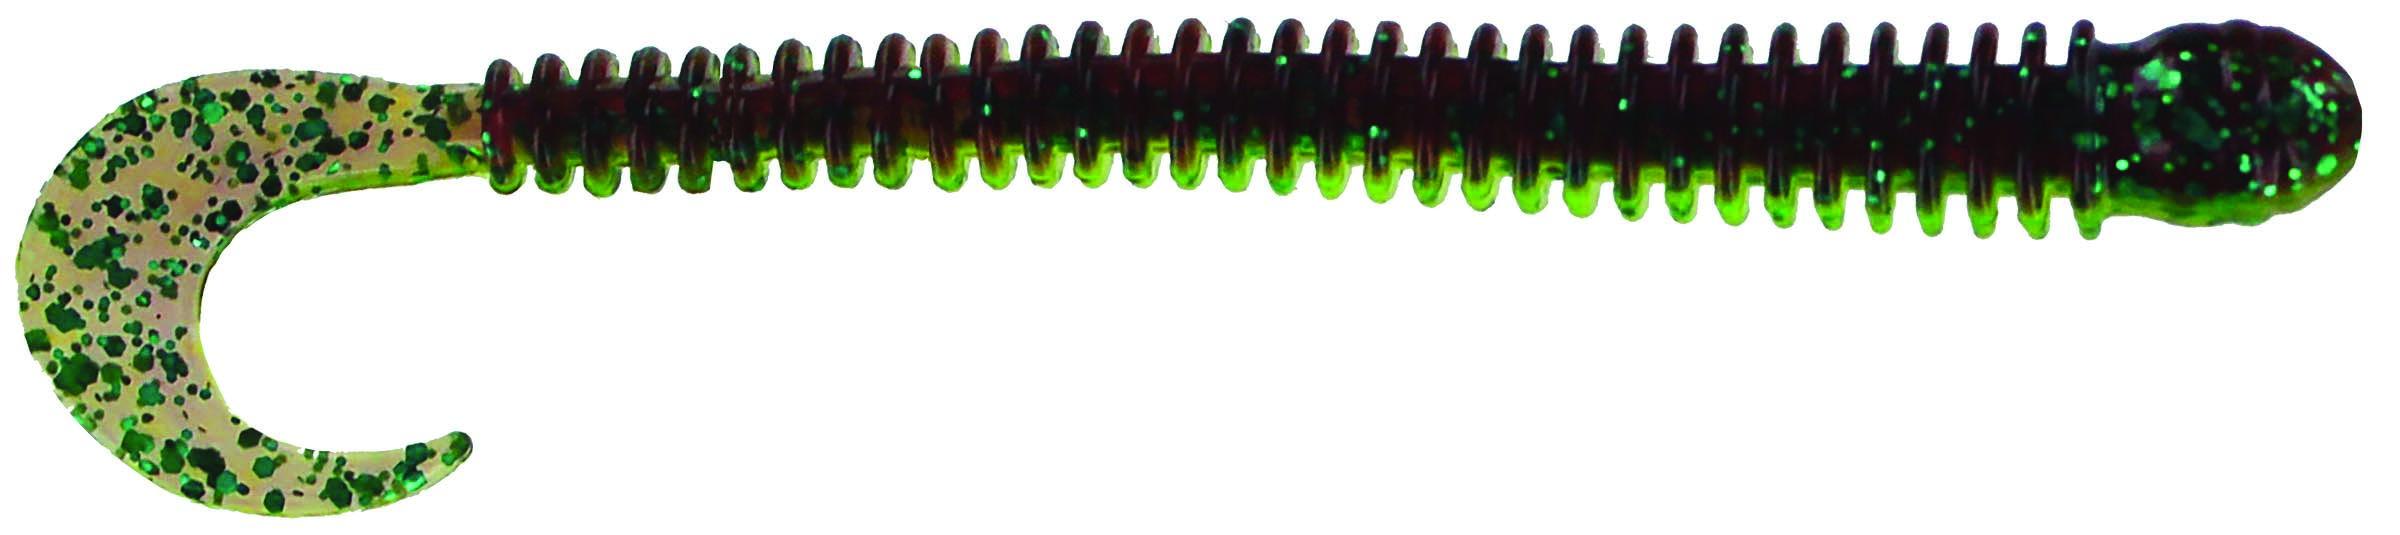 Big Bite Baits - Disc Ring Worm - 4 inch - RW-423 - SOUR GRAPE